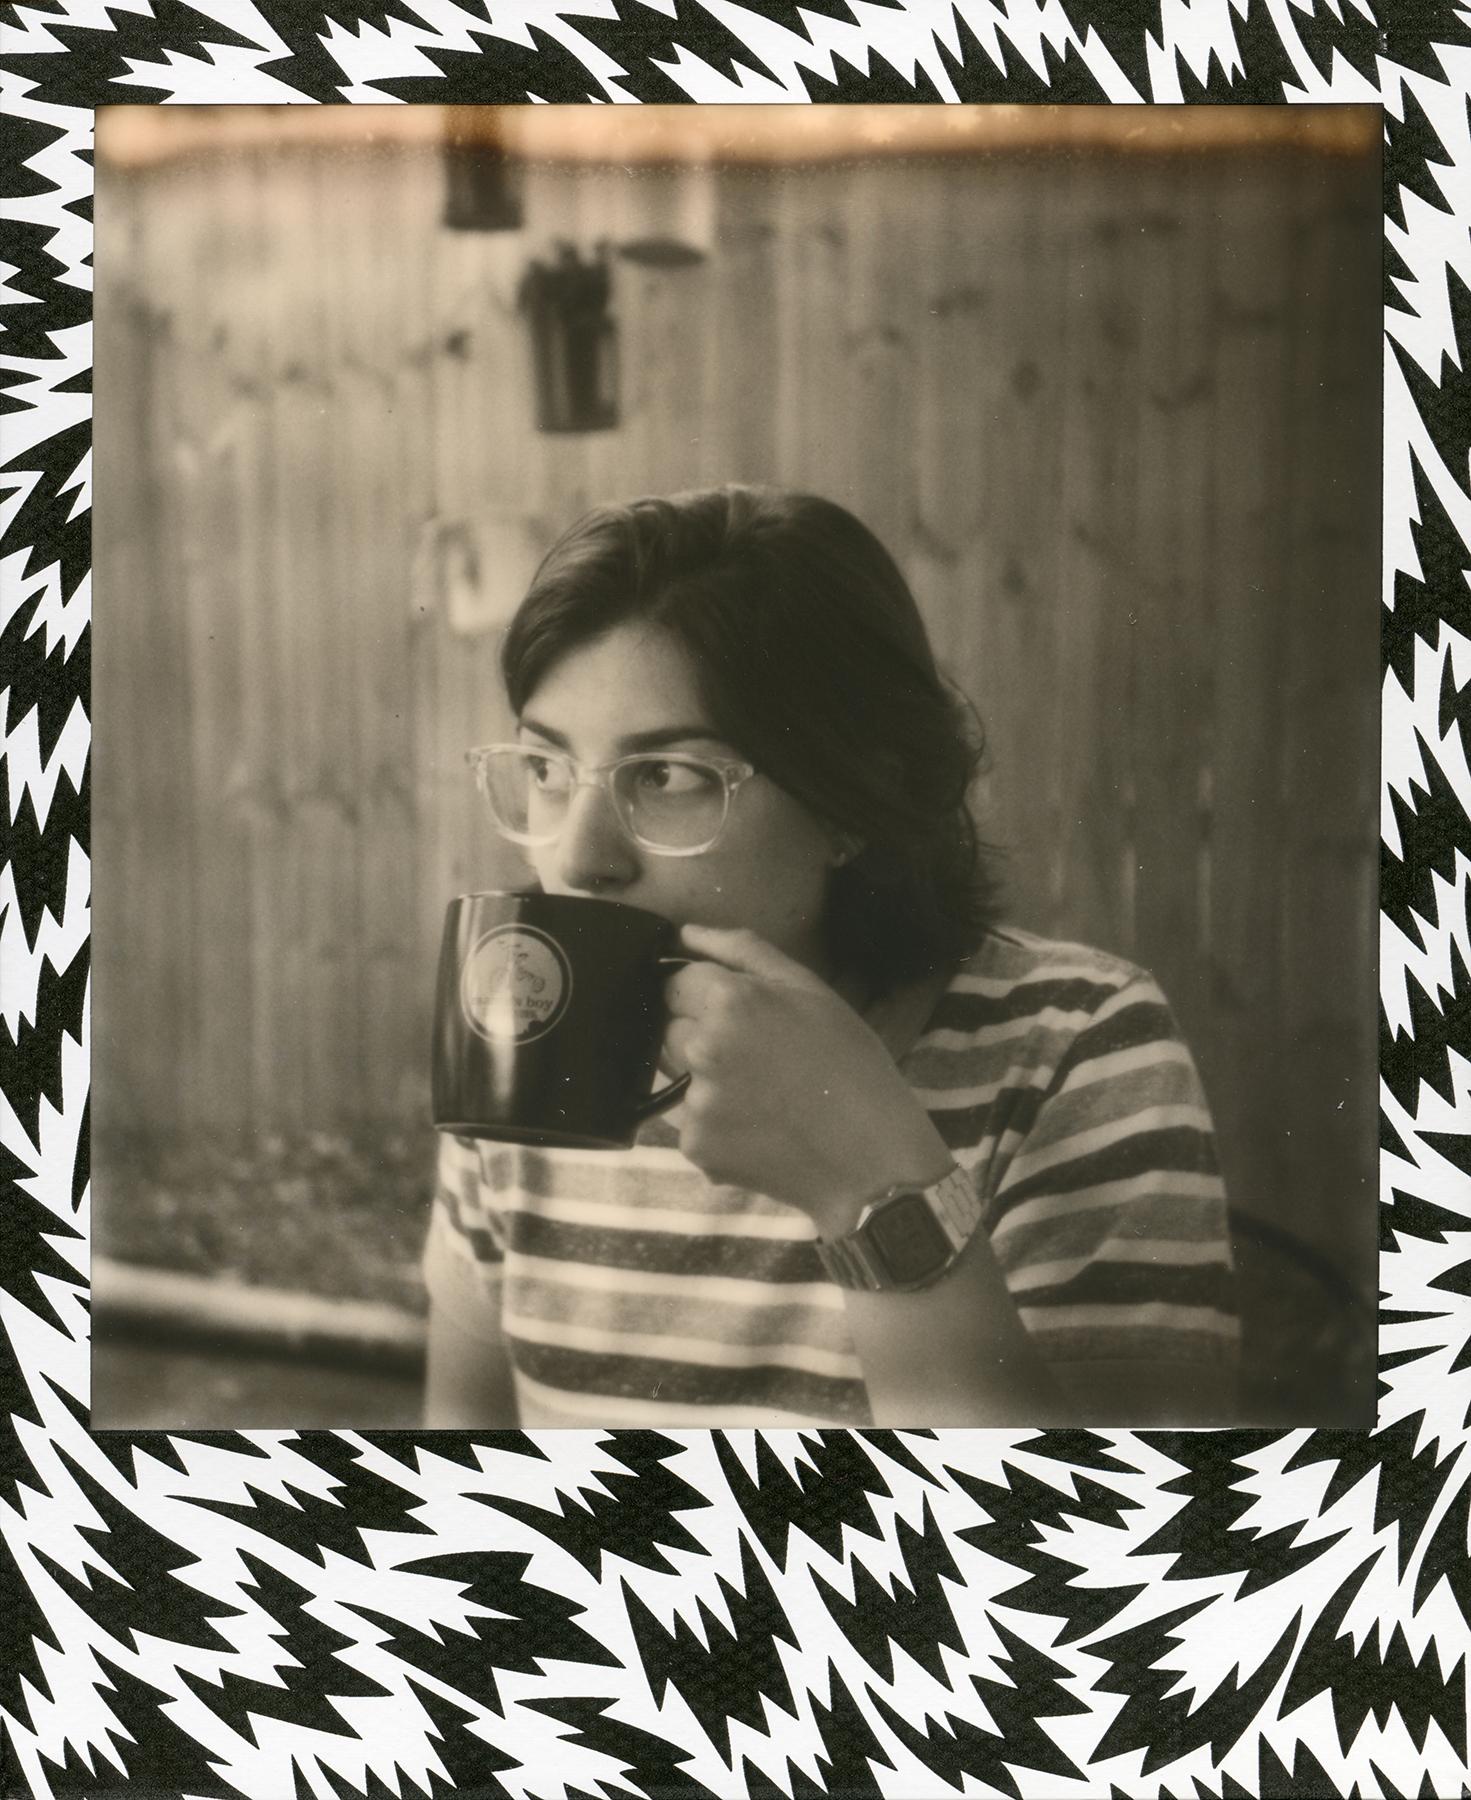 Taryn | Polaroid Sun 660 | Impossible black and white expired film | David Burgh